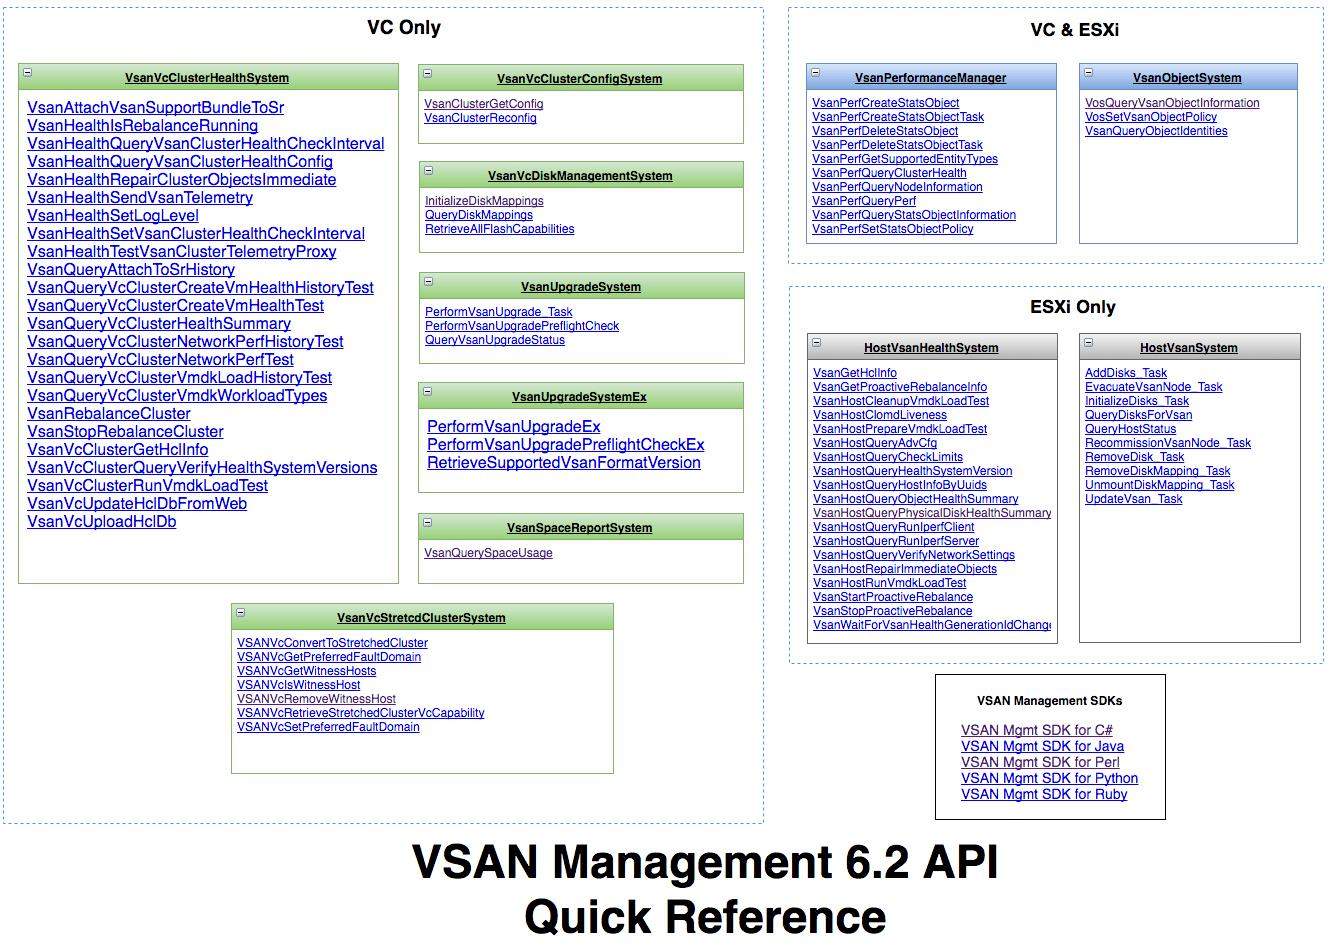 vsan62-management-api-quick-reference